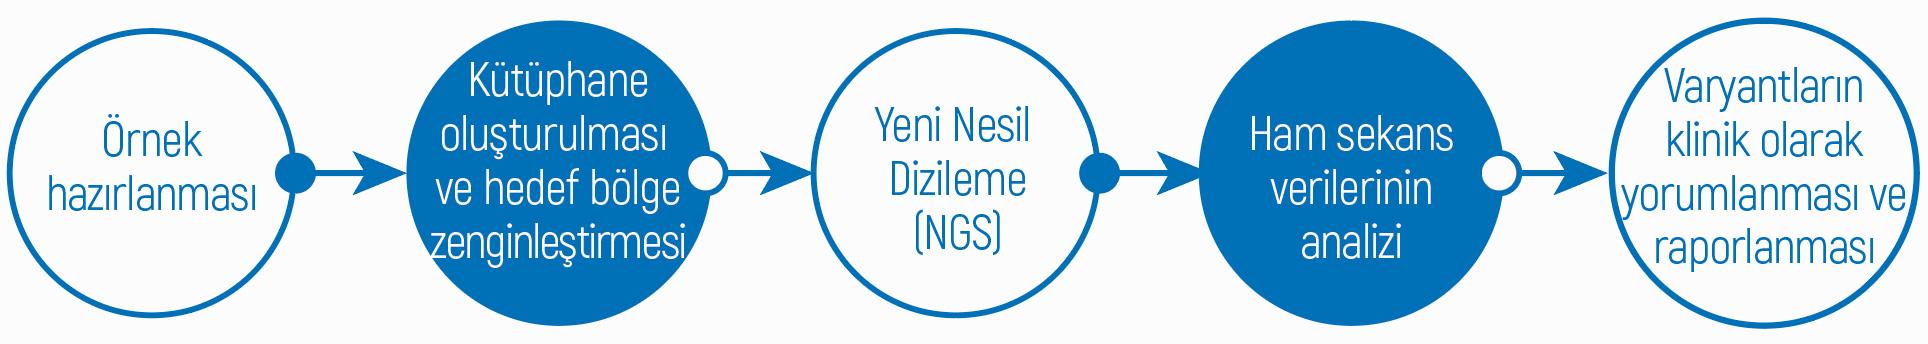 onkogenetiks-tmy-msi-analizinin-genel-is-akisi